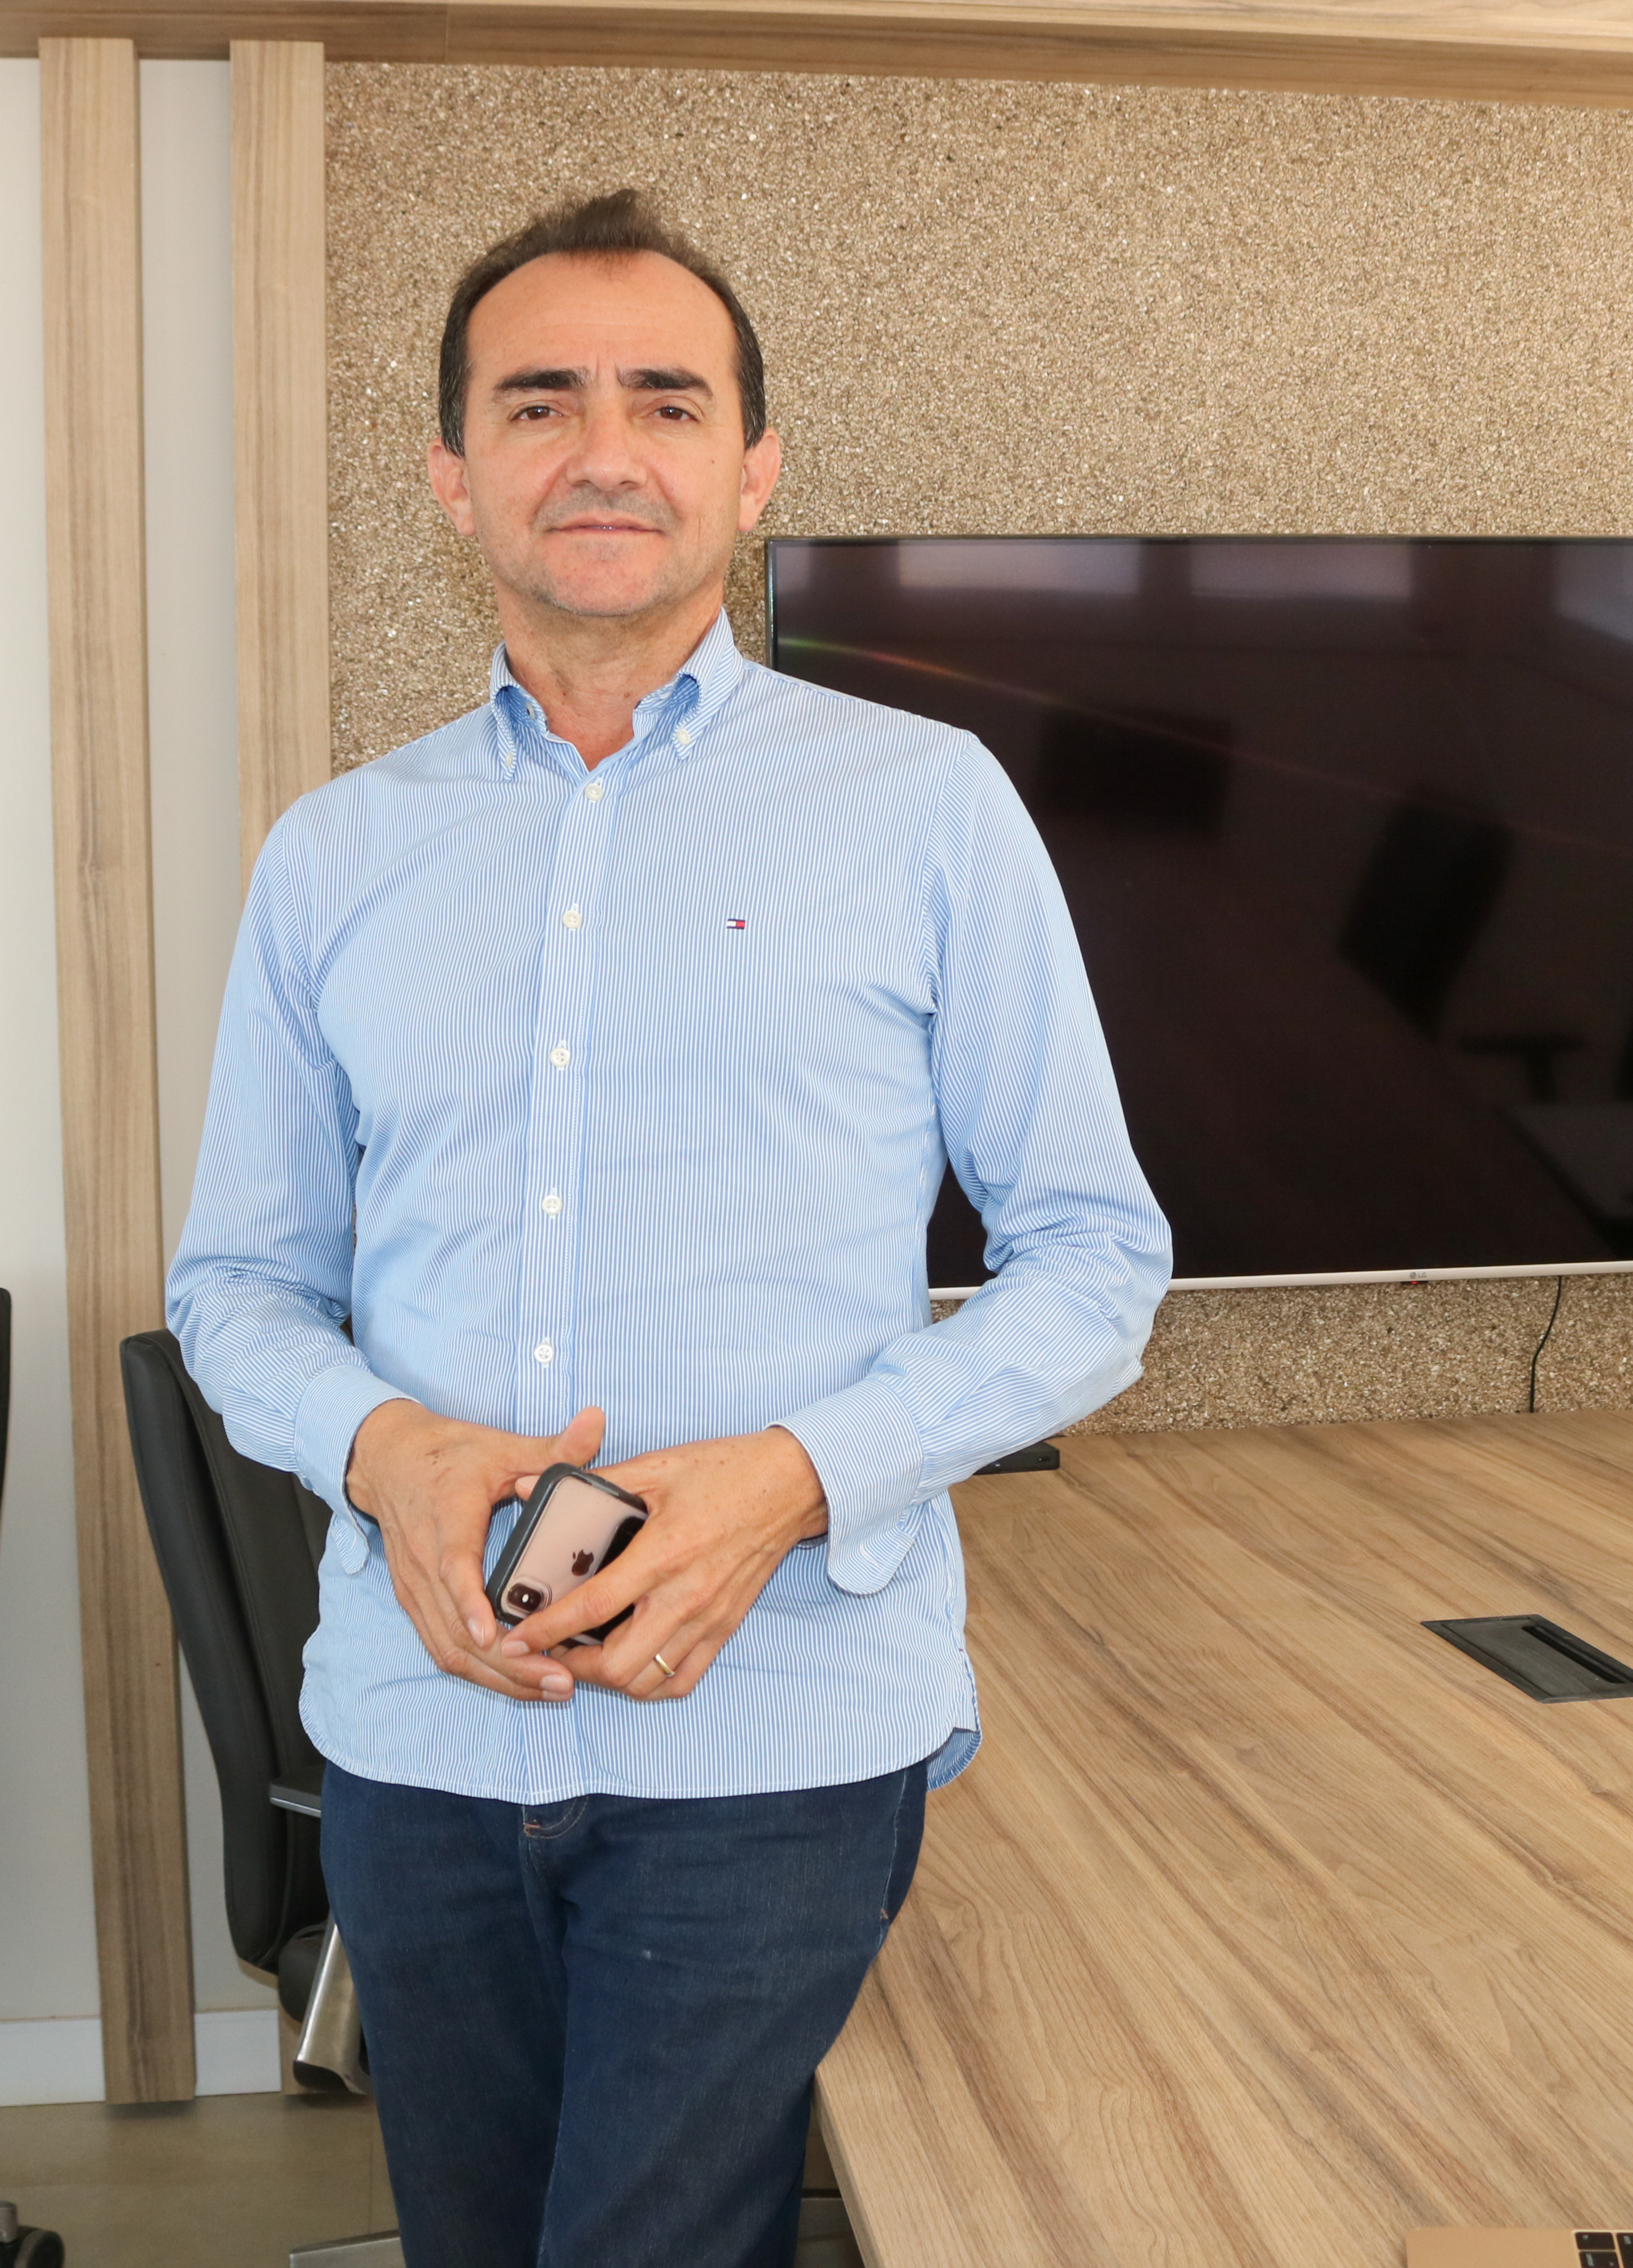 José Roberto Nogueira, CEO da Brisanet (Foto: Deisa Garcêz/Especial para O Povo)